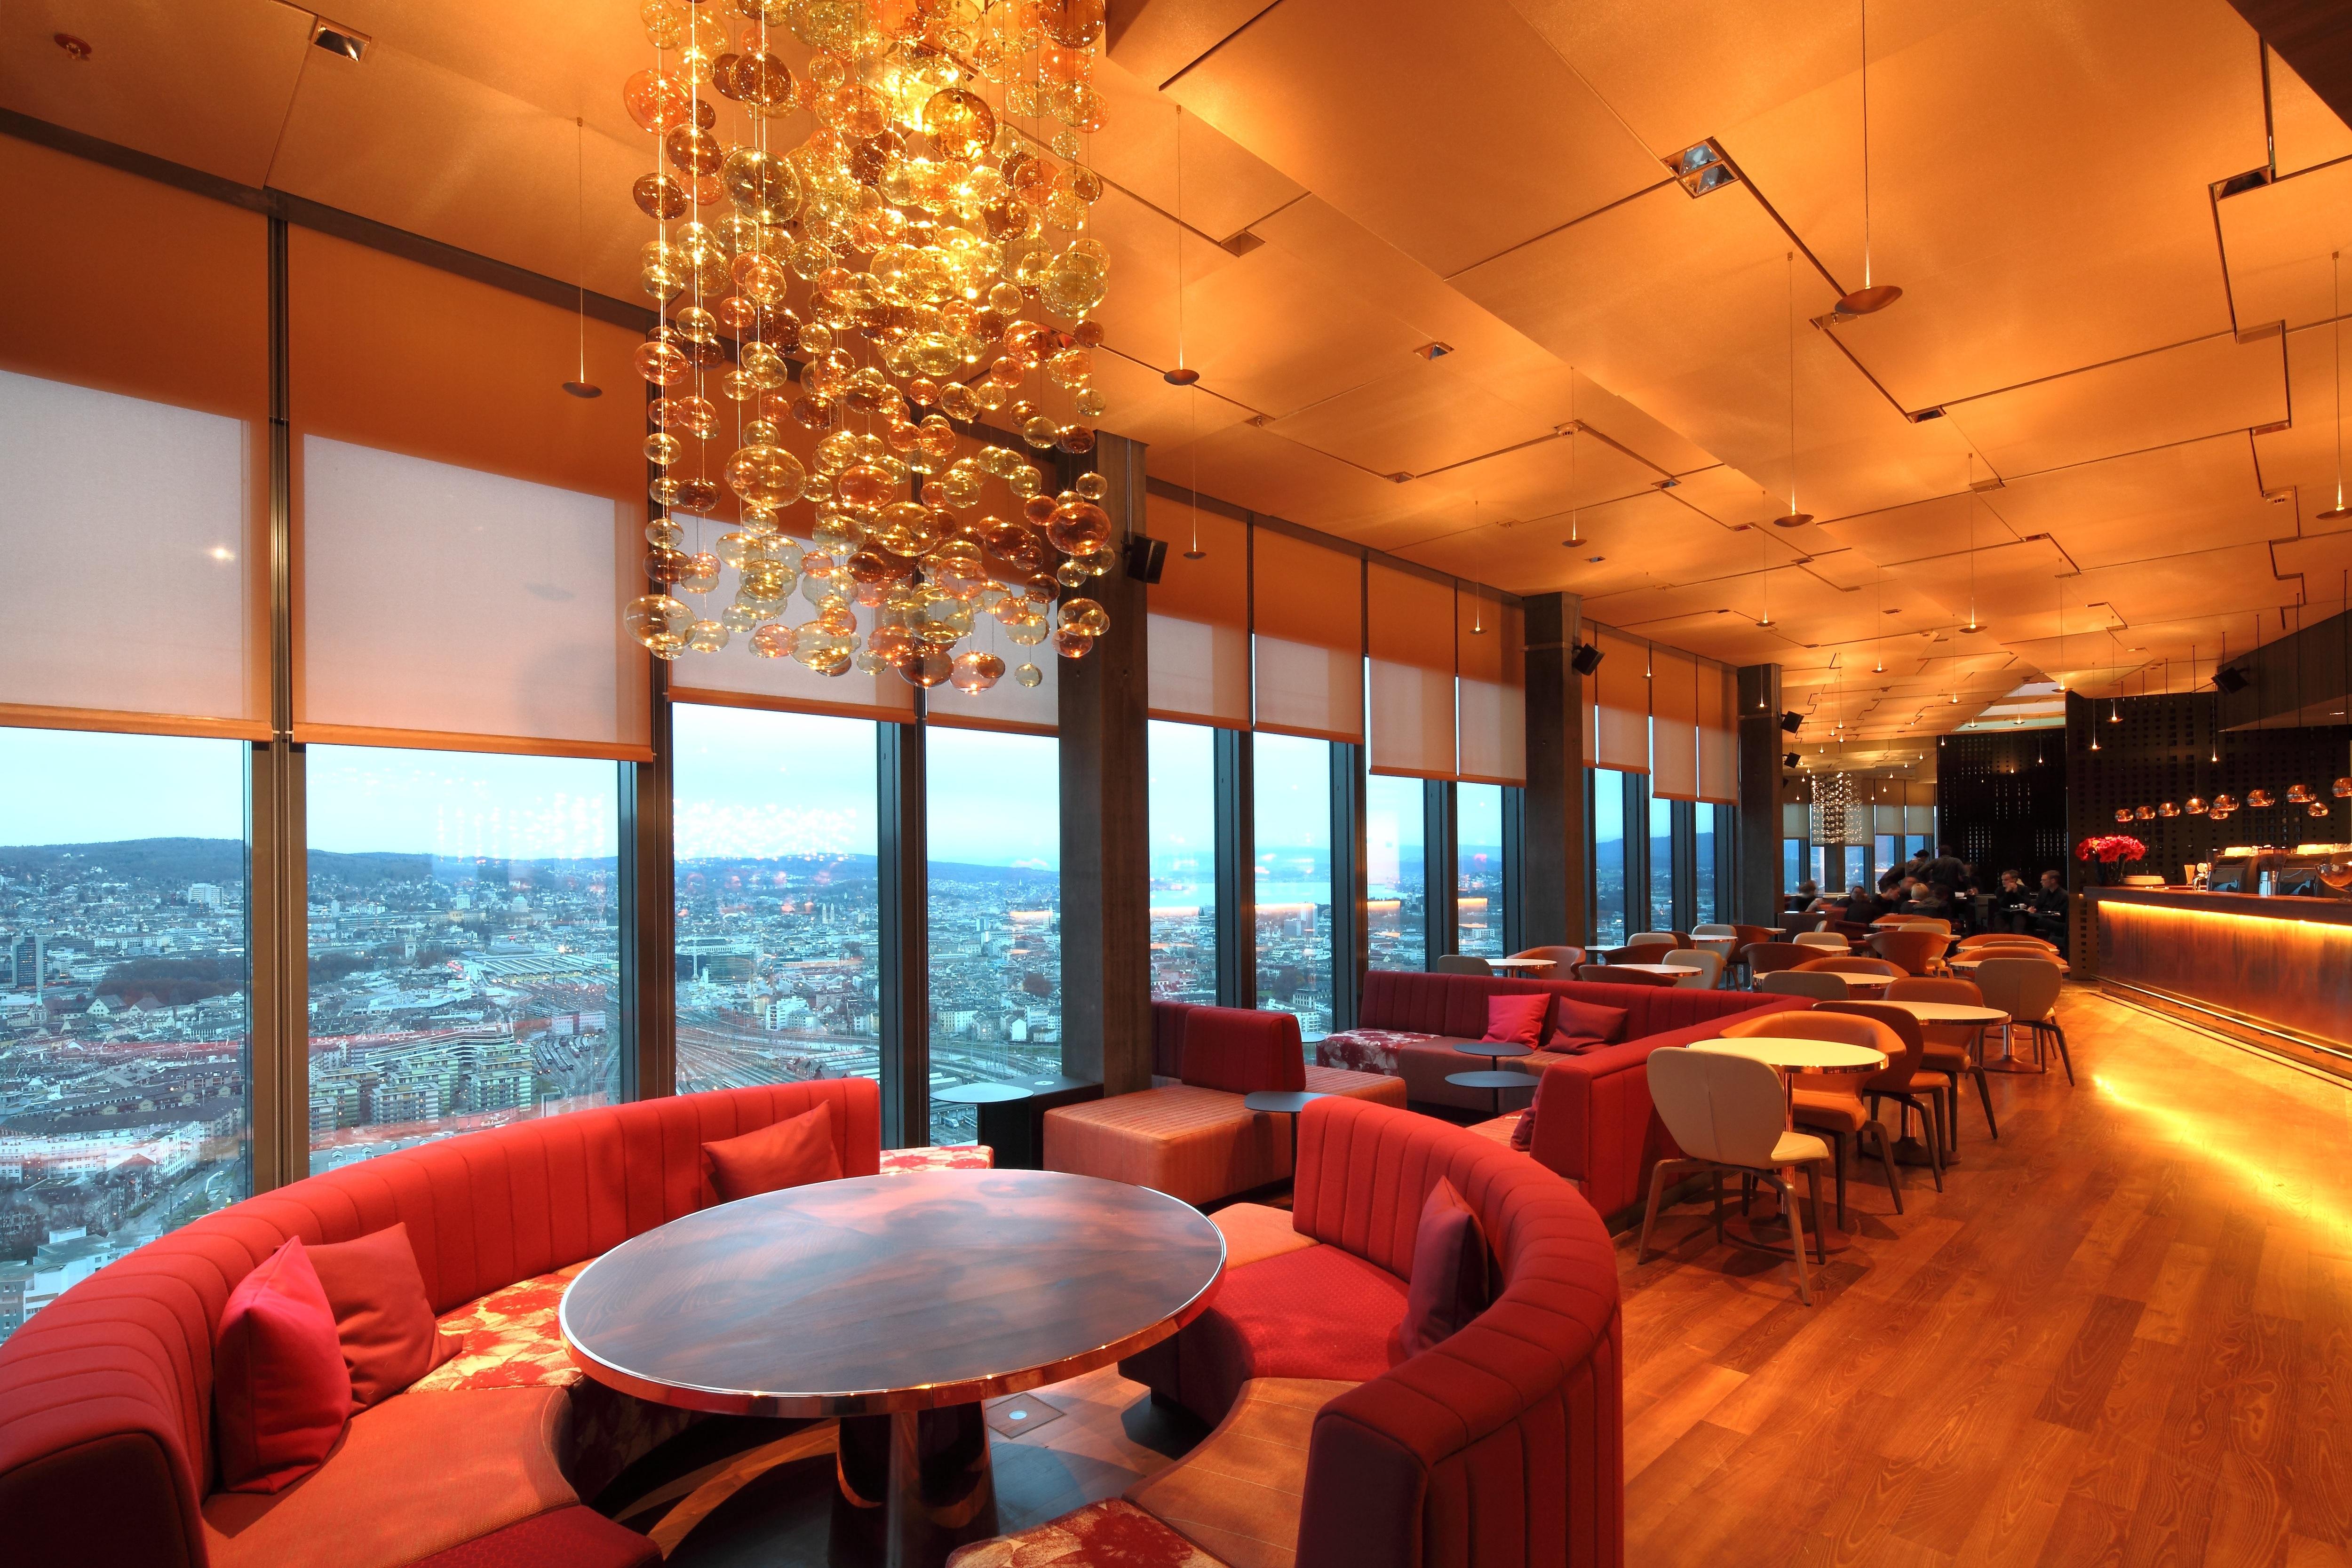 Prime Tower Clouds Restaurant And Deutsche Bank